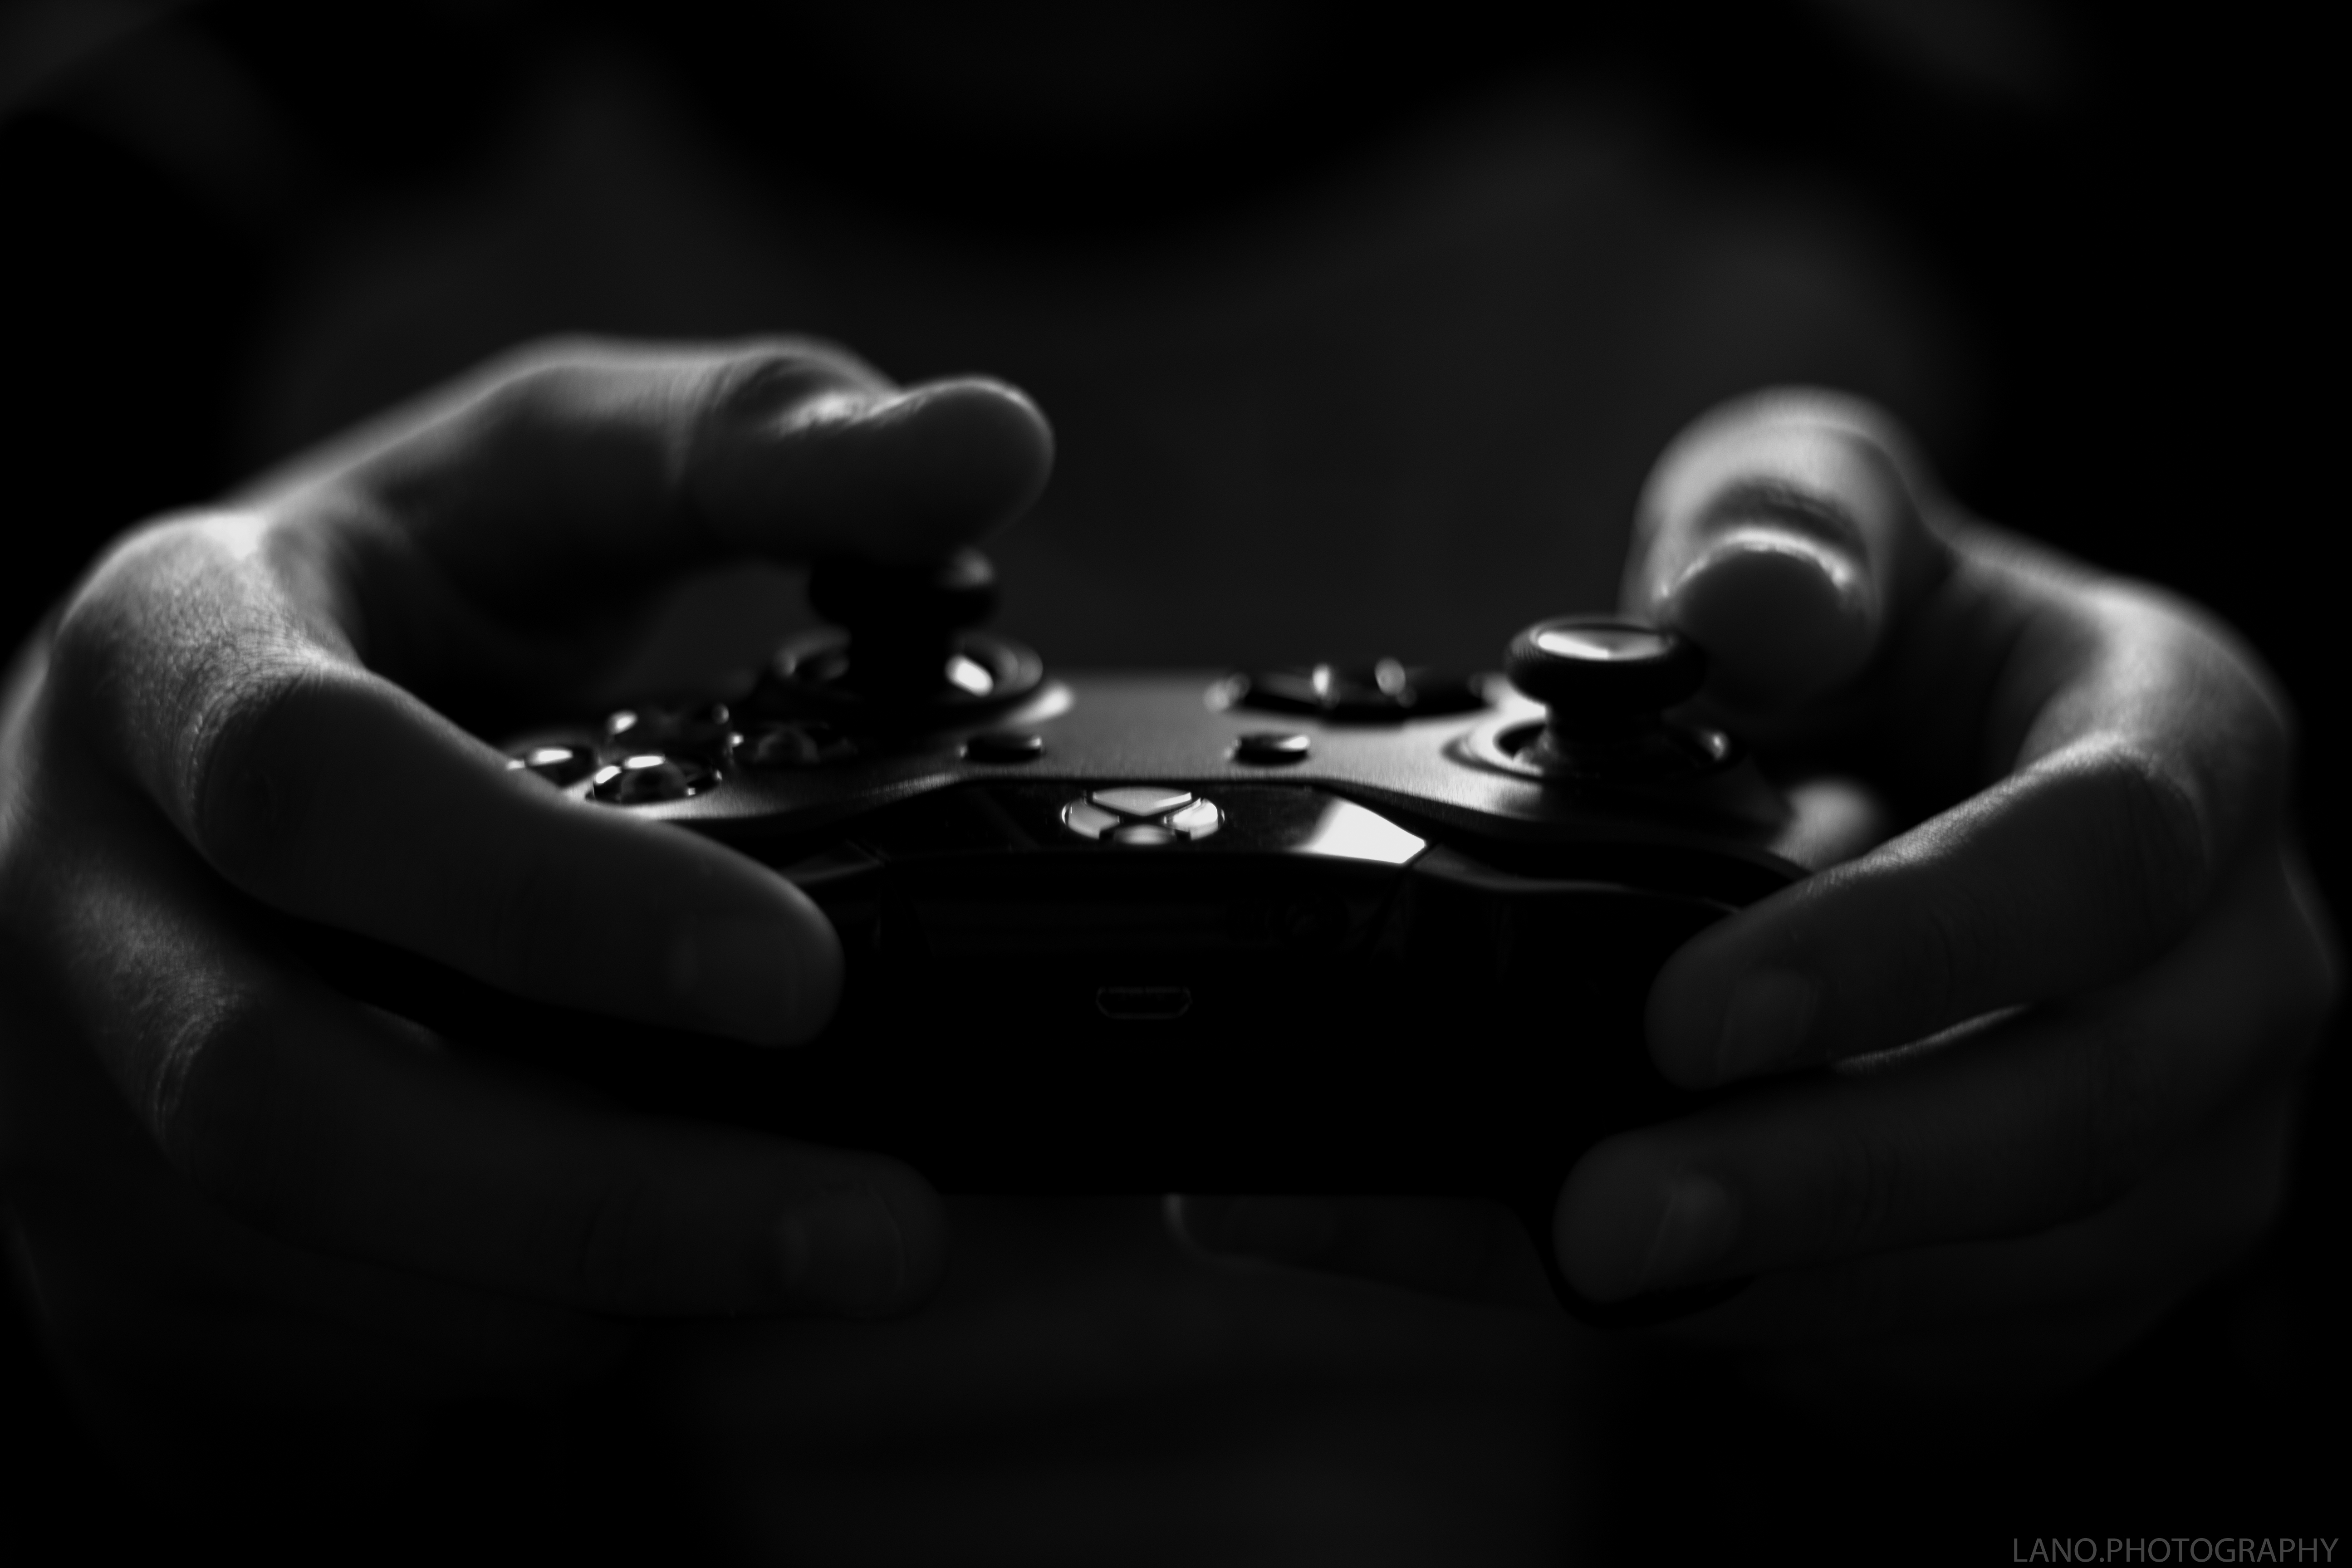 free stock photos of gaming pexels